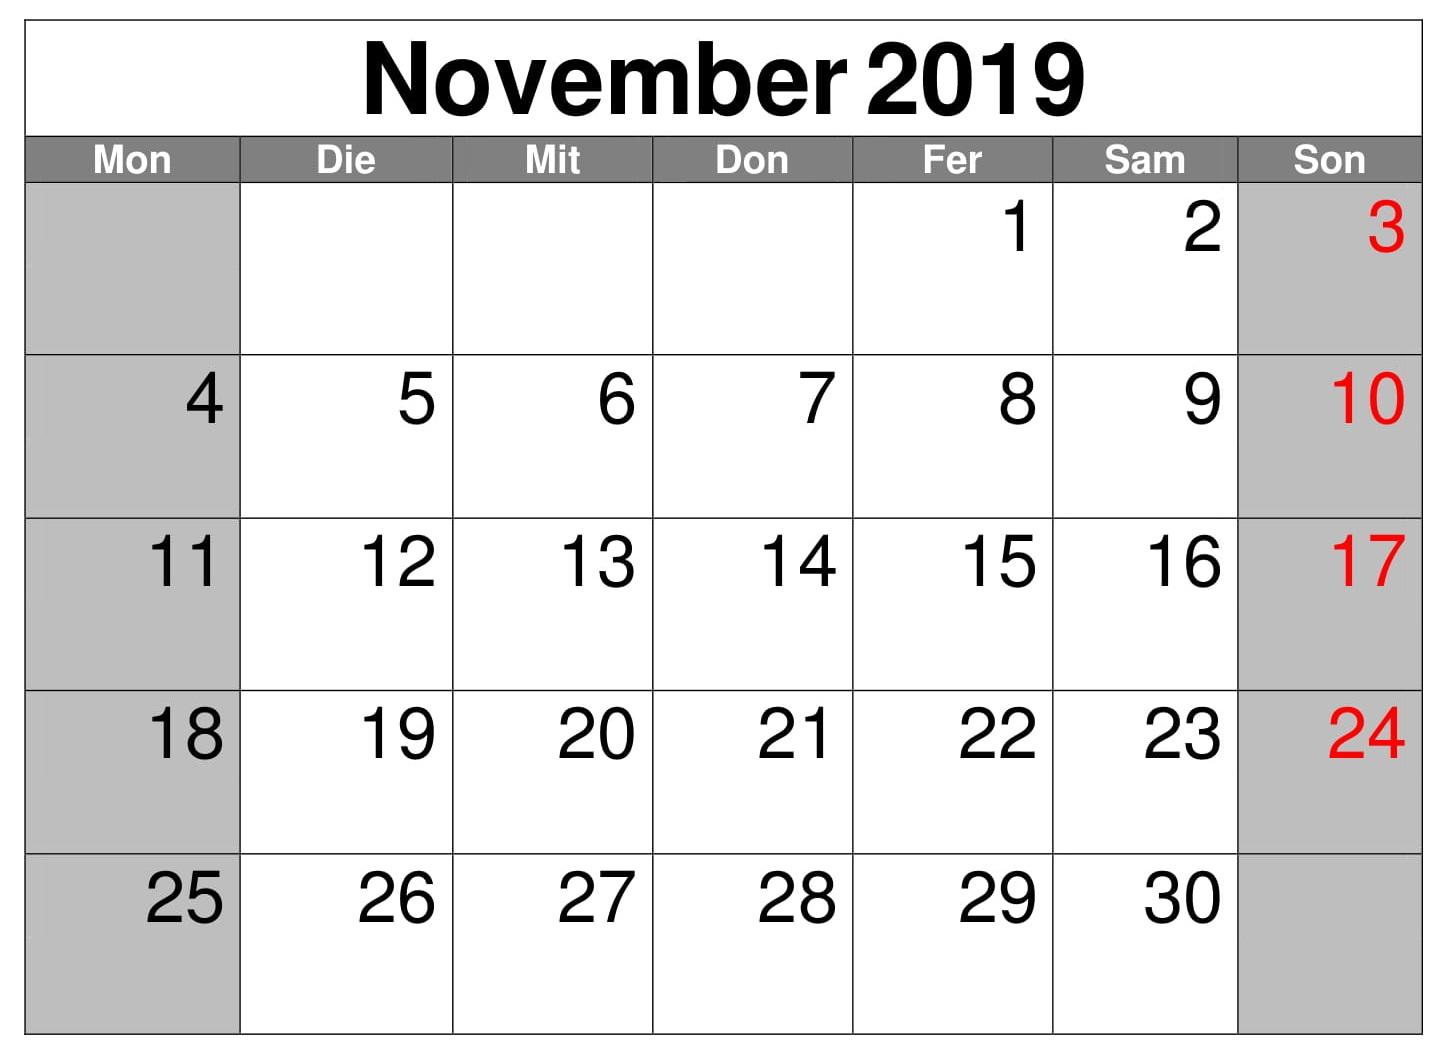 Montas Kalender 2019 November Words November 2019 Calendar